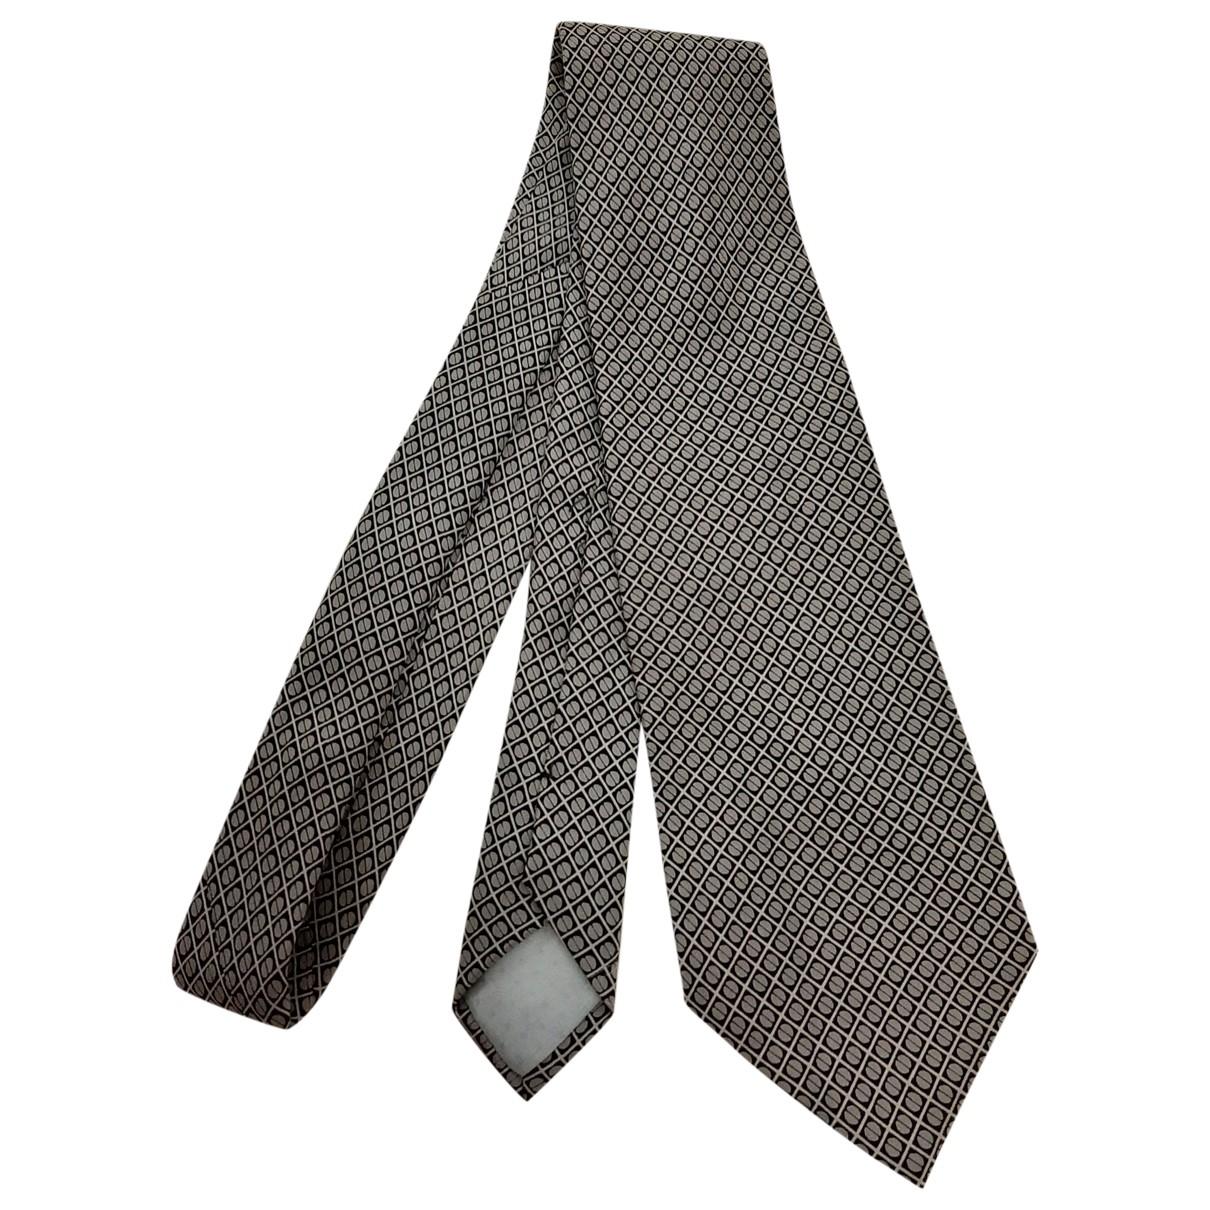 Yves Saint Laurent \N Krawatten in  Grau Seide